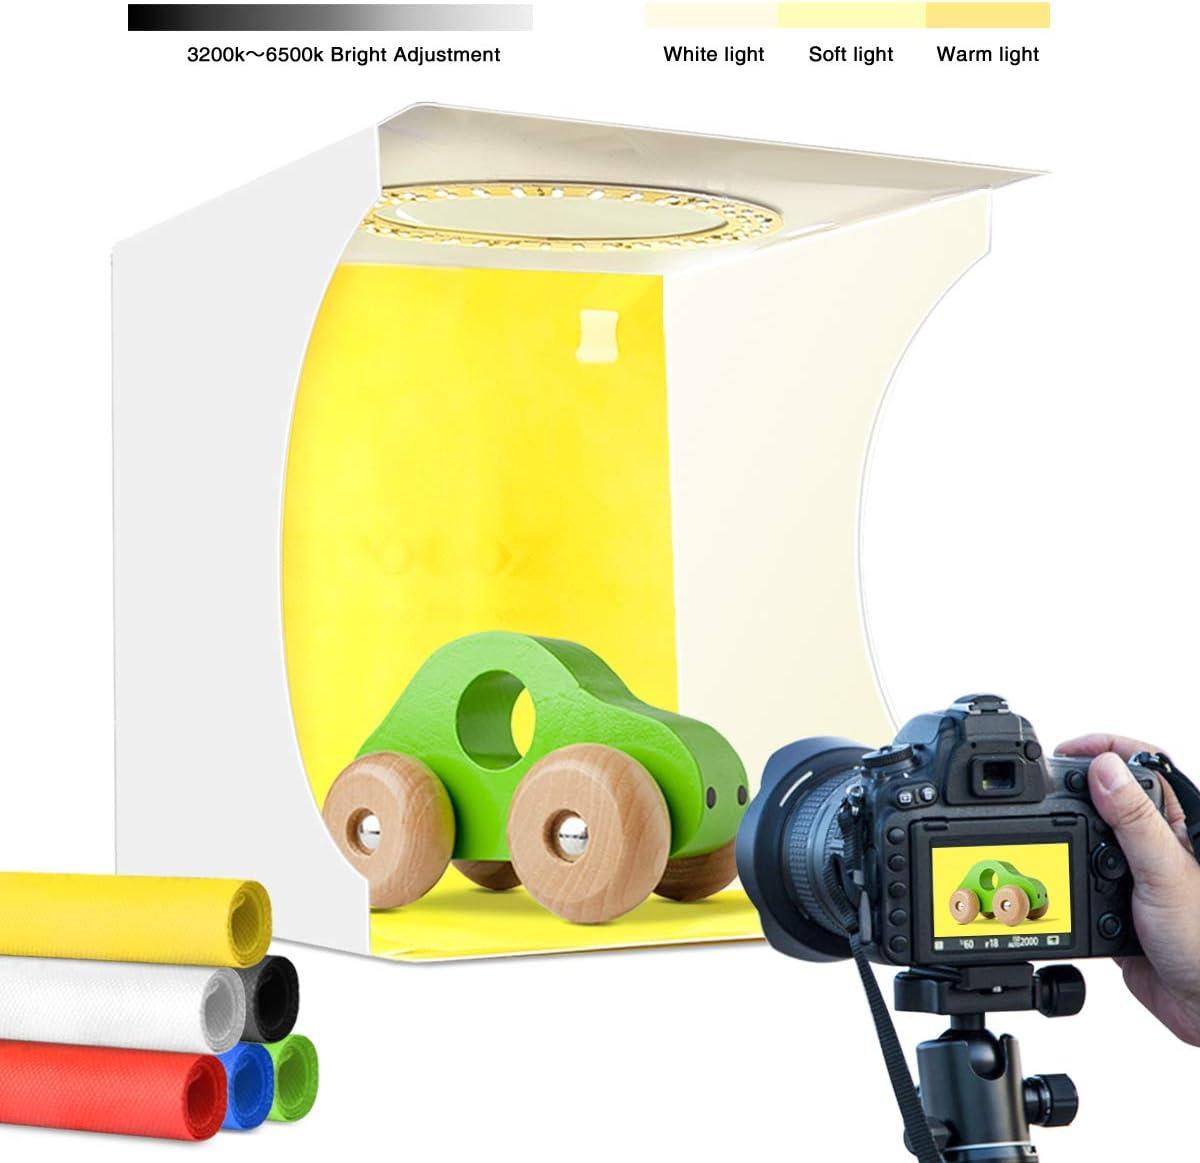 Adjustable Light Photo Studio Box Photo Studio Shooting Tent with Ring White Light 6500K Warm Light 3200K 24cm x 23cm x 23cm Portable Photography Lighting softbox 6 Color Backdrop kit